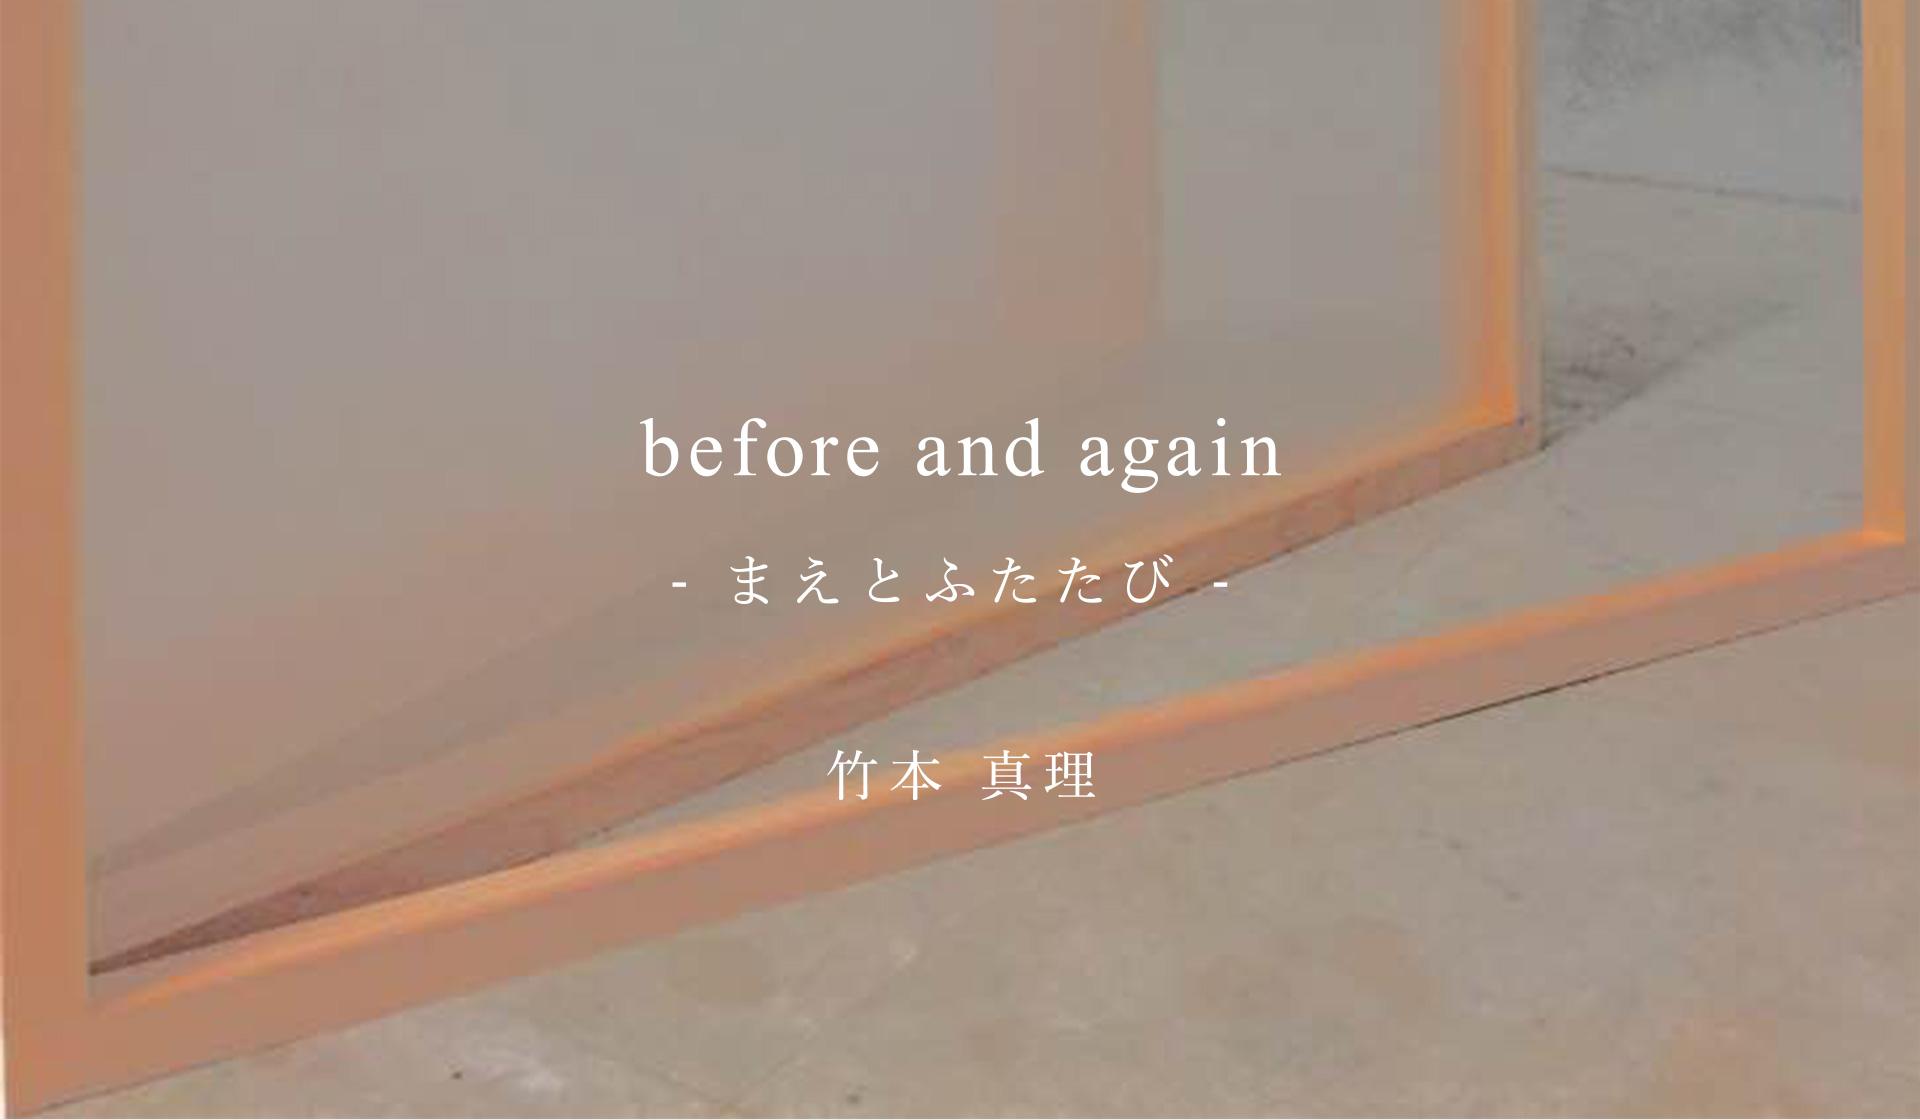 mari takemoto | before and again